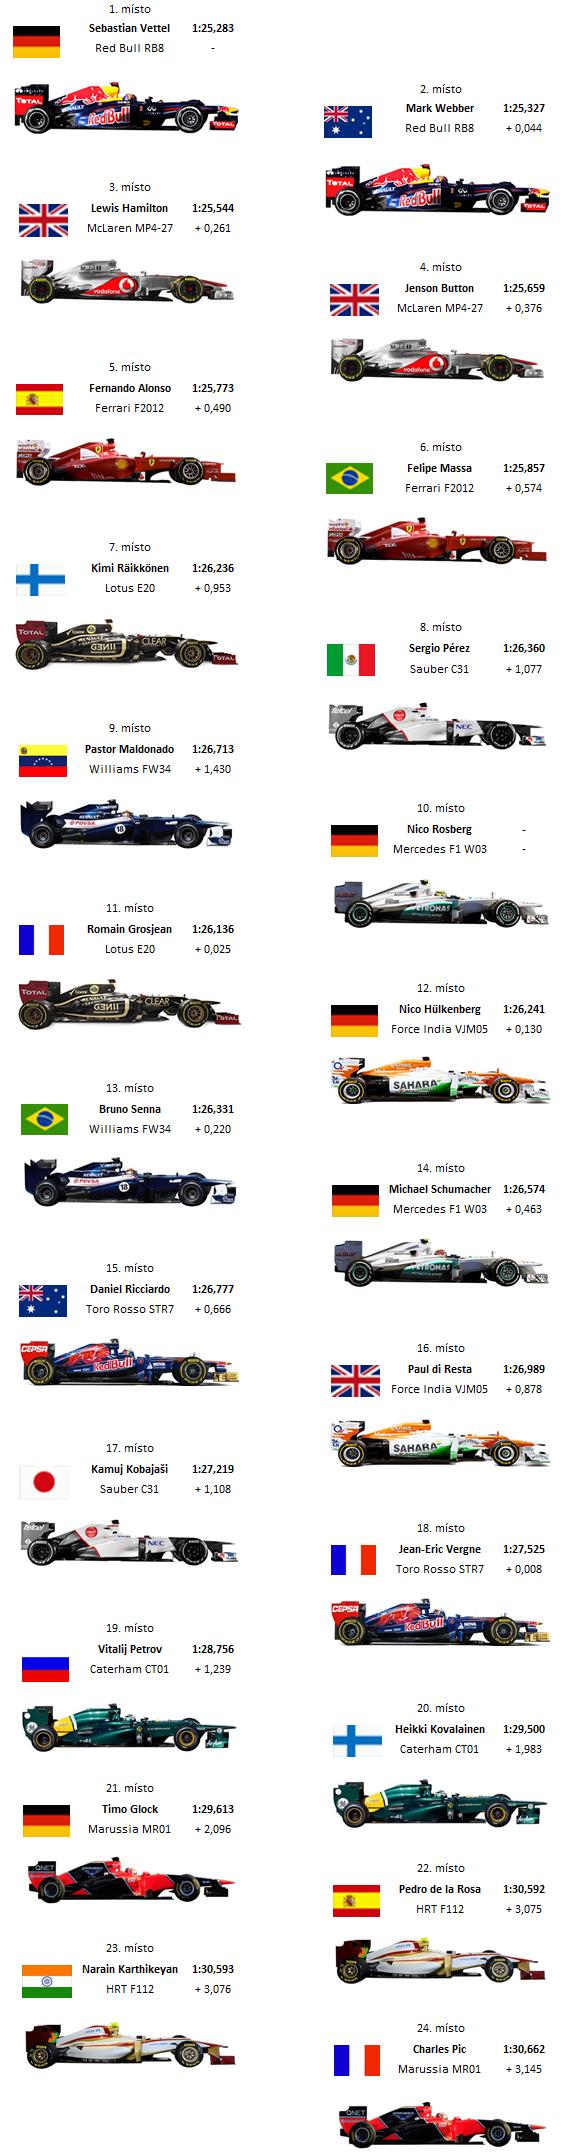 starting grid india graphics